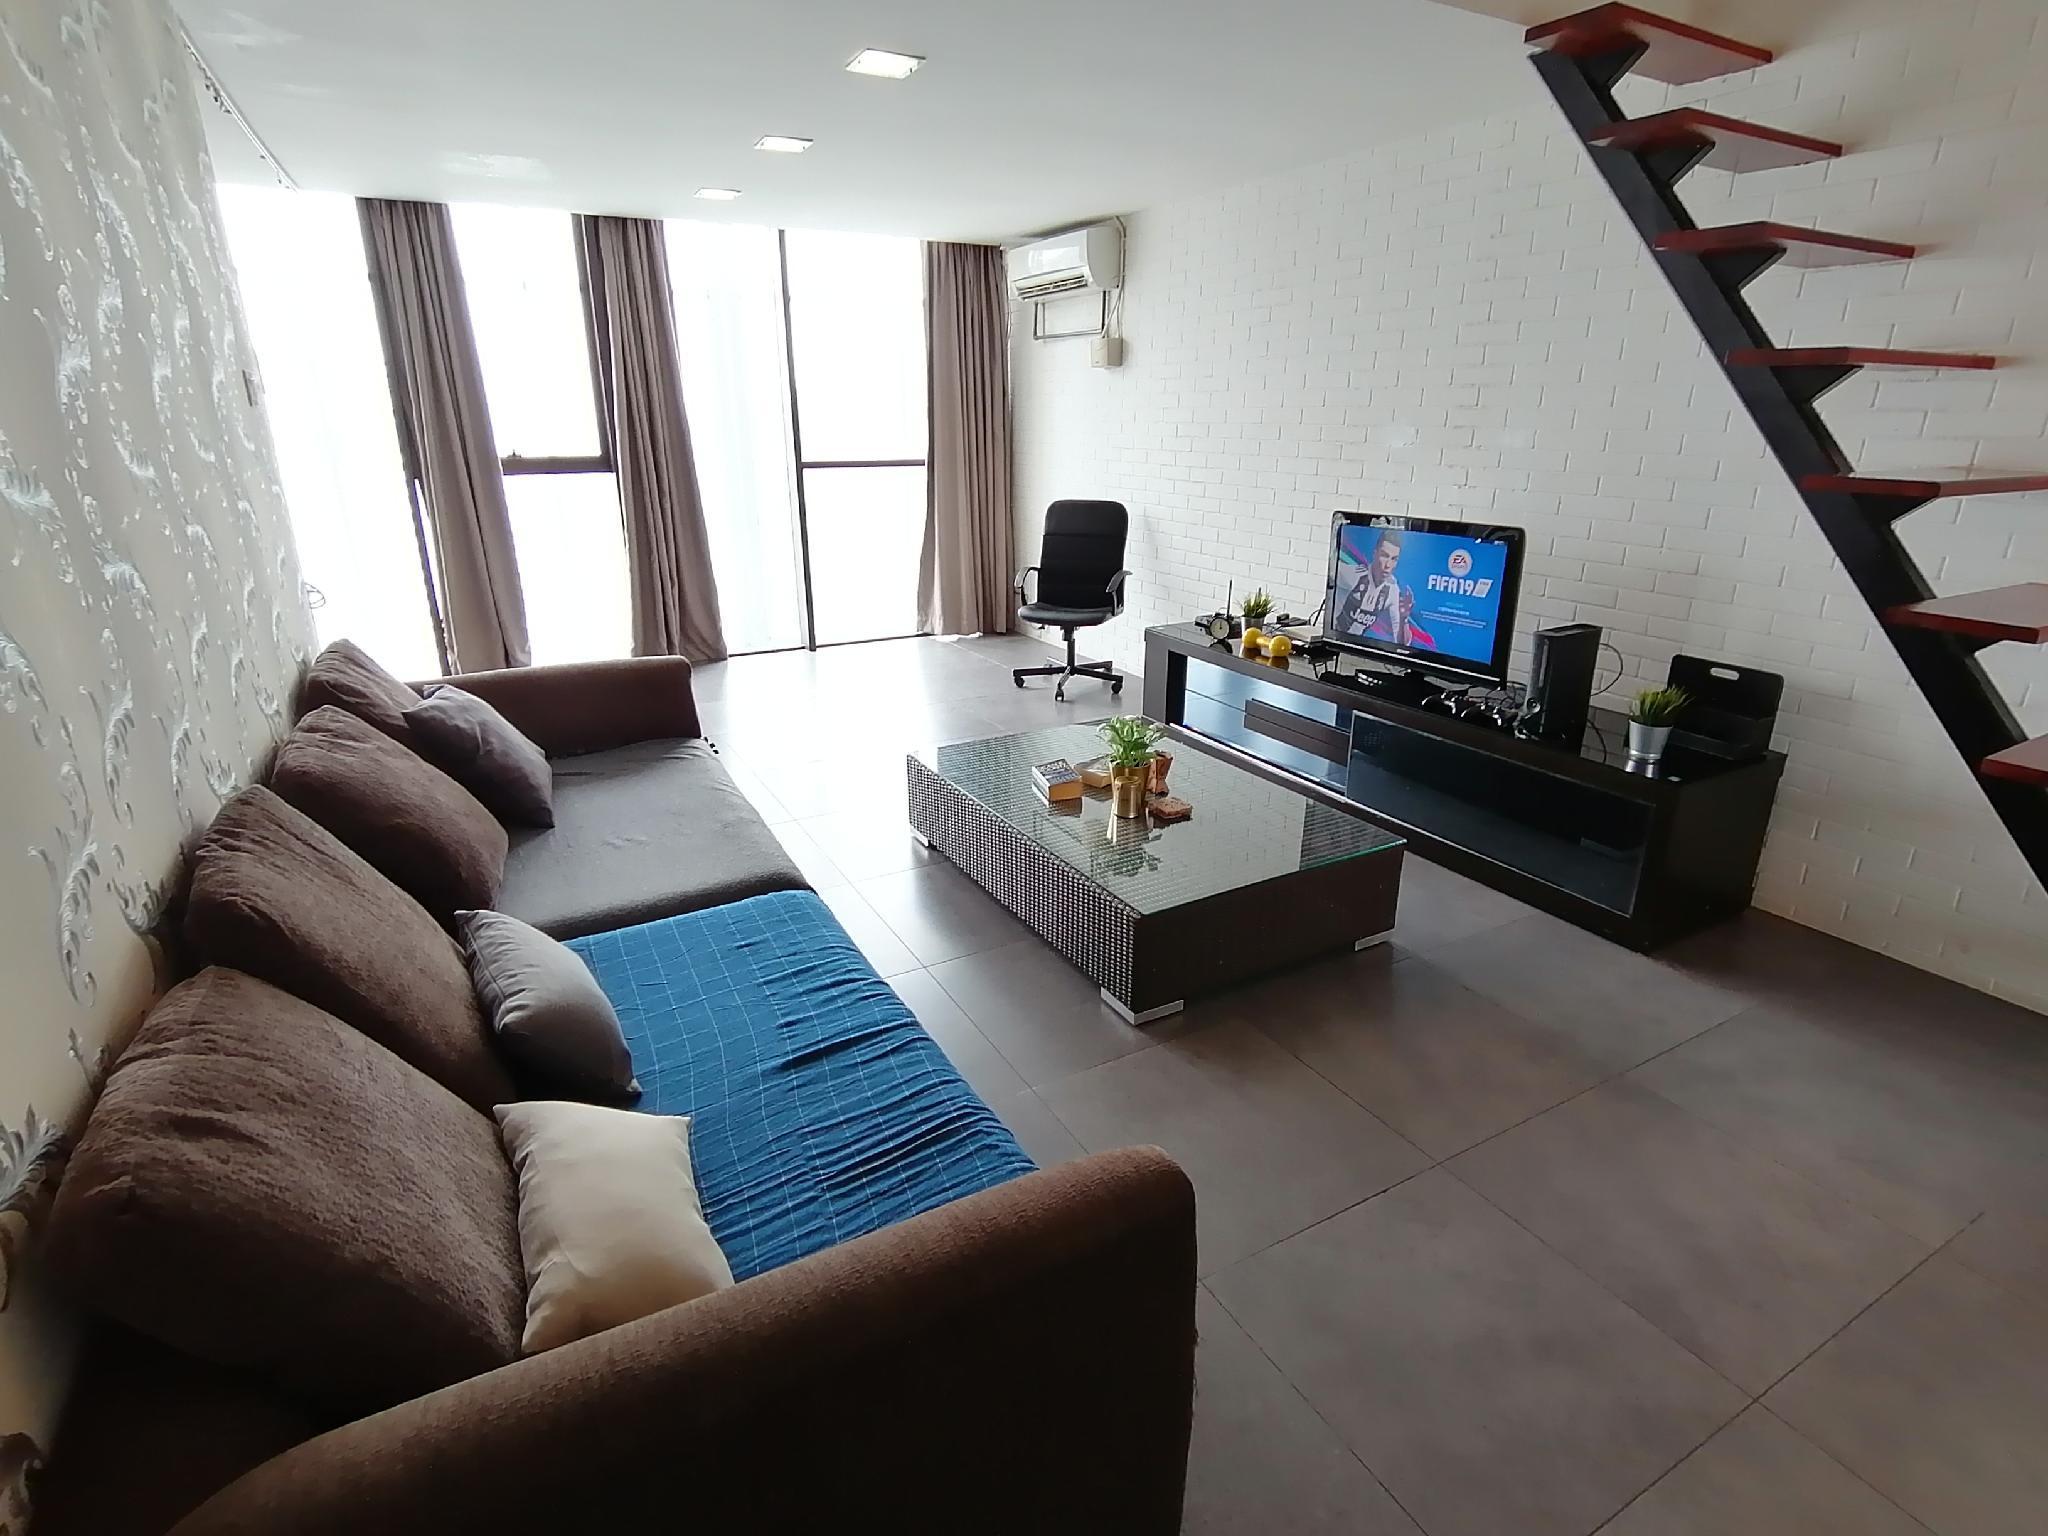 2 Empire Cozy Suite WIFI+TvBox + X Box360   153a